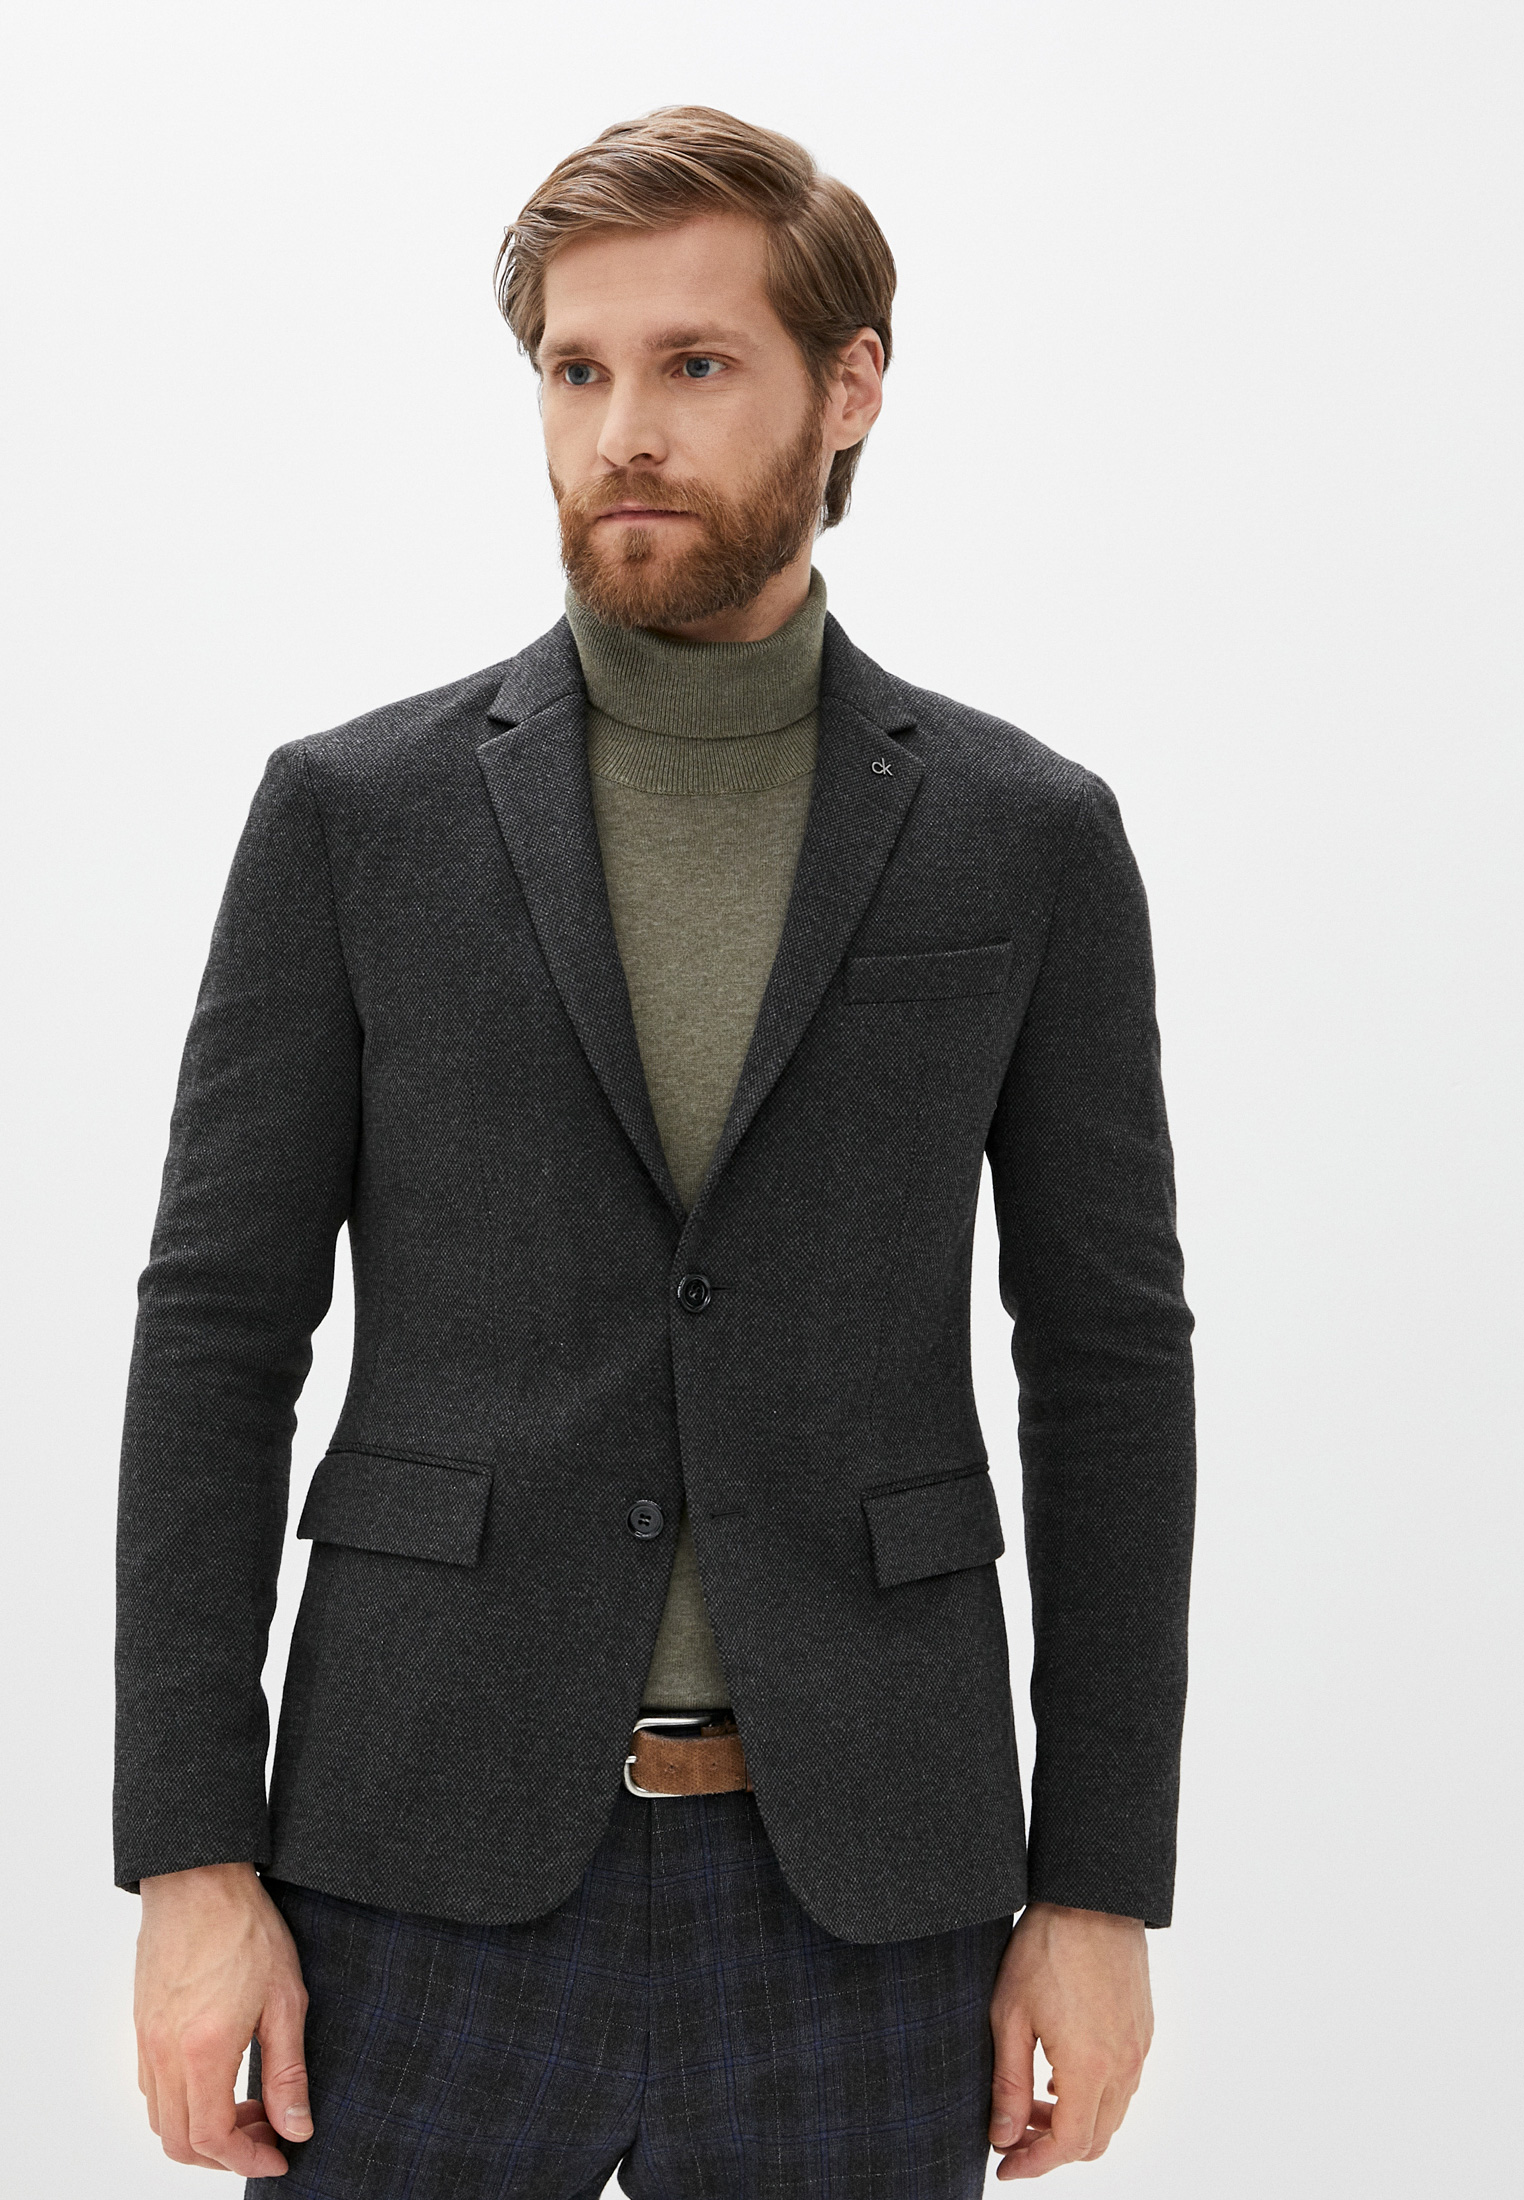 Мужской пиджак Calvin Klein (Кельвин Кляйн) k10k106097